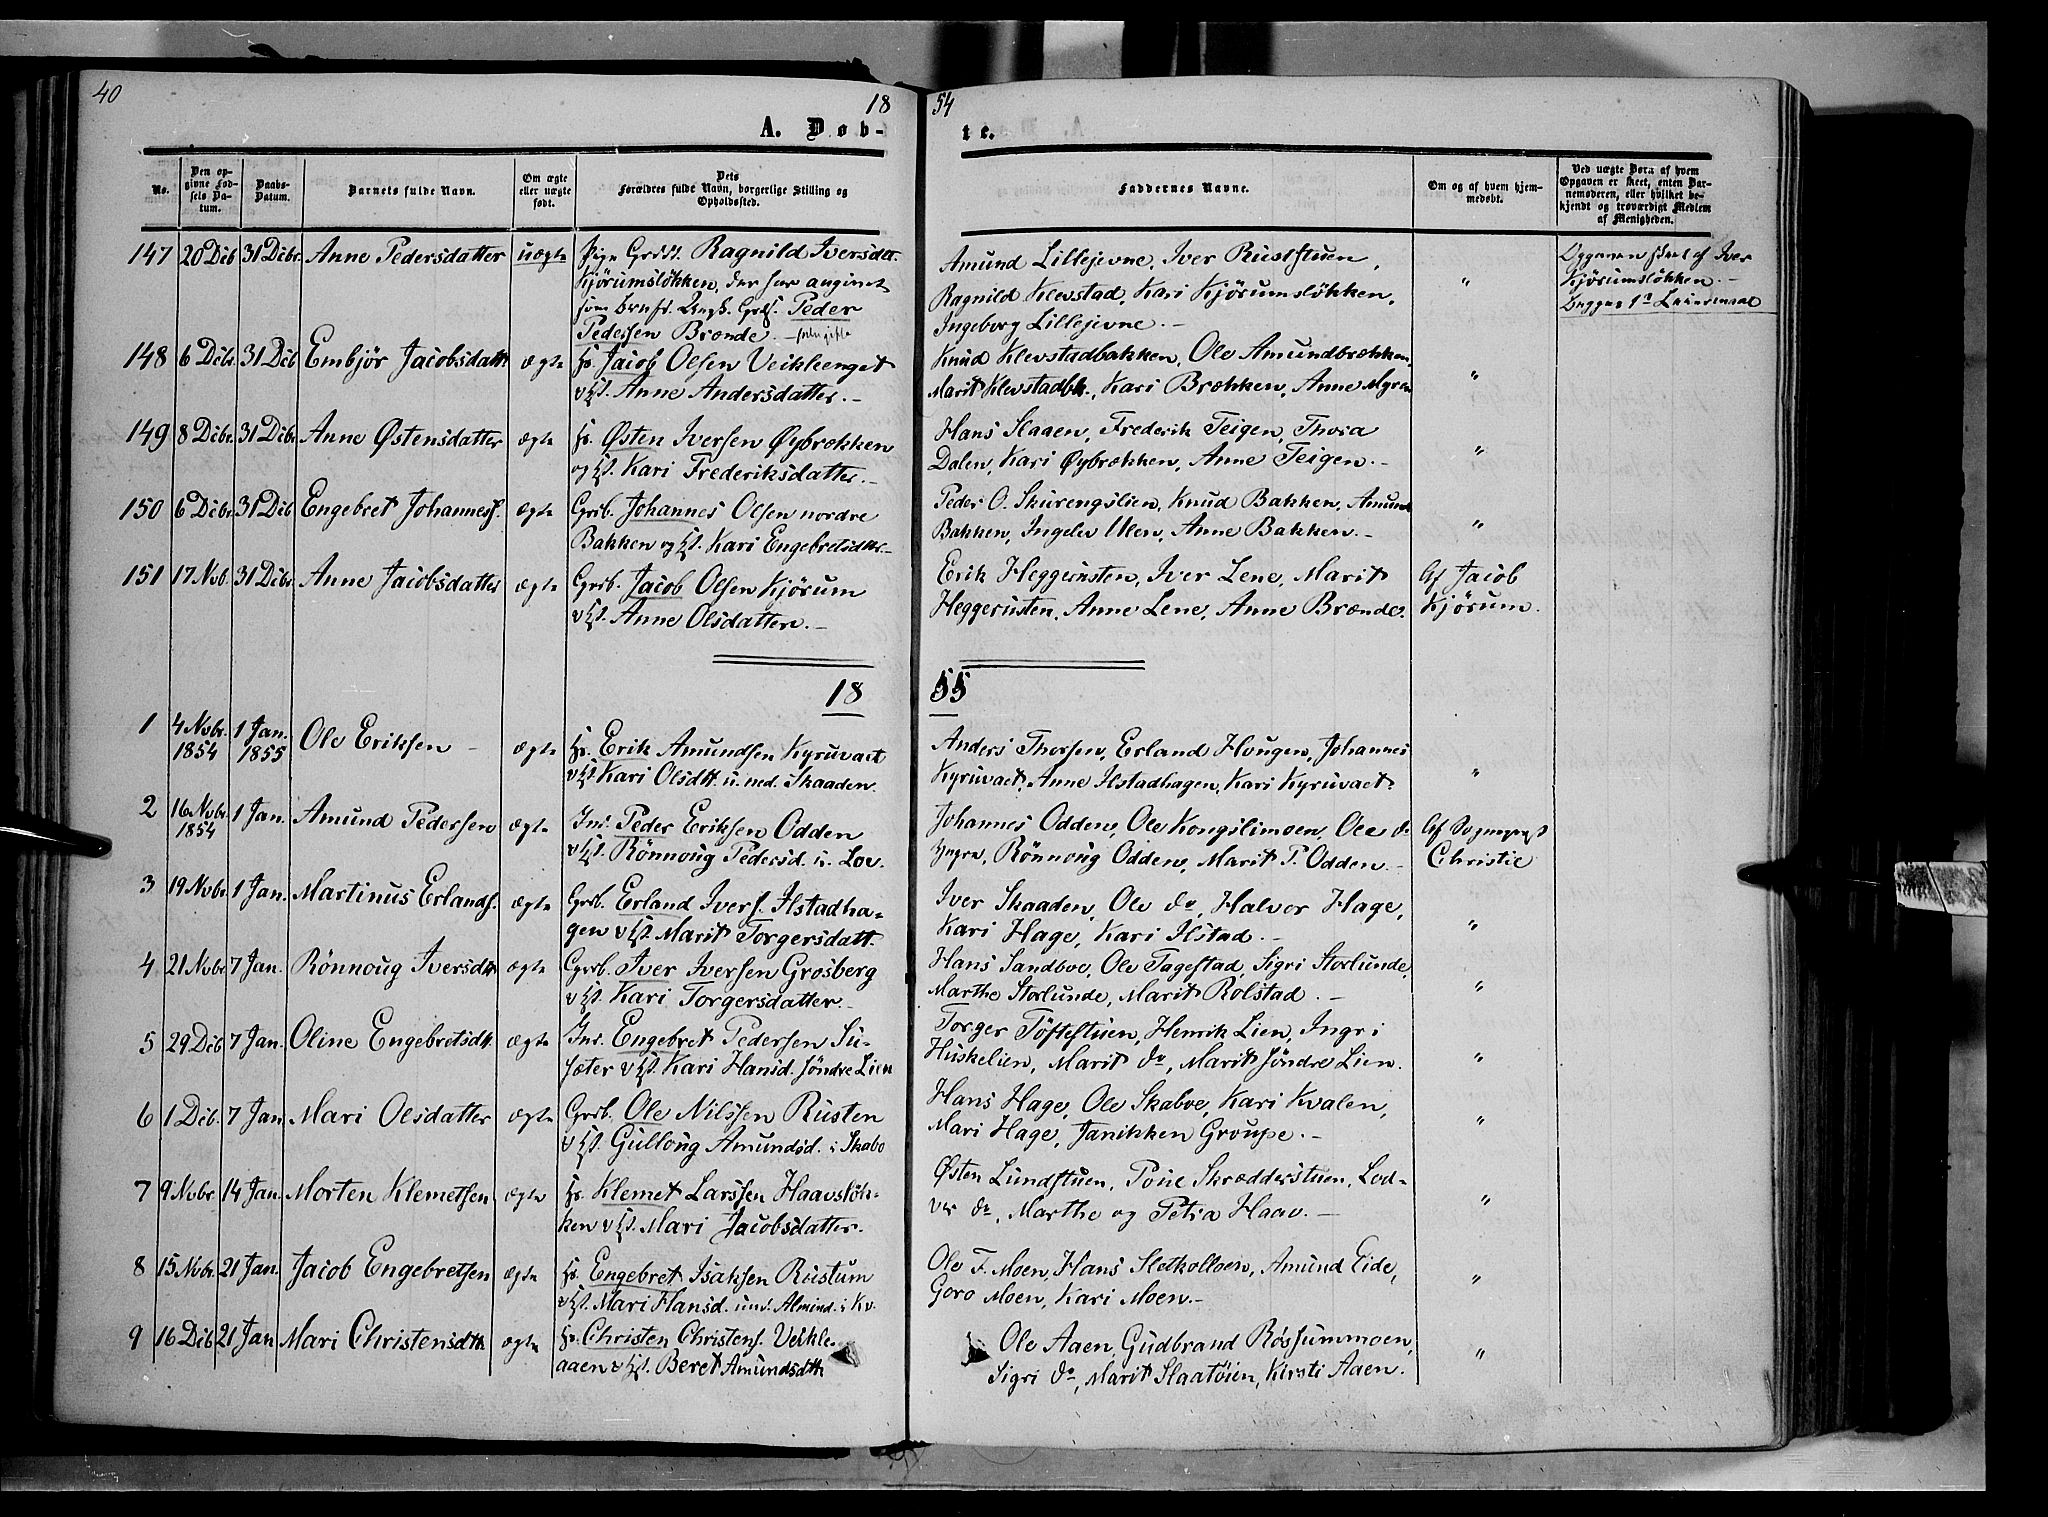 SAH, Nord-Fron prestekontor, Ministerialbok nr. 1, 1851-1864, s. 40